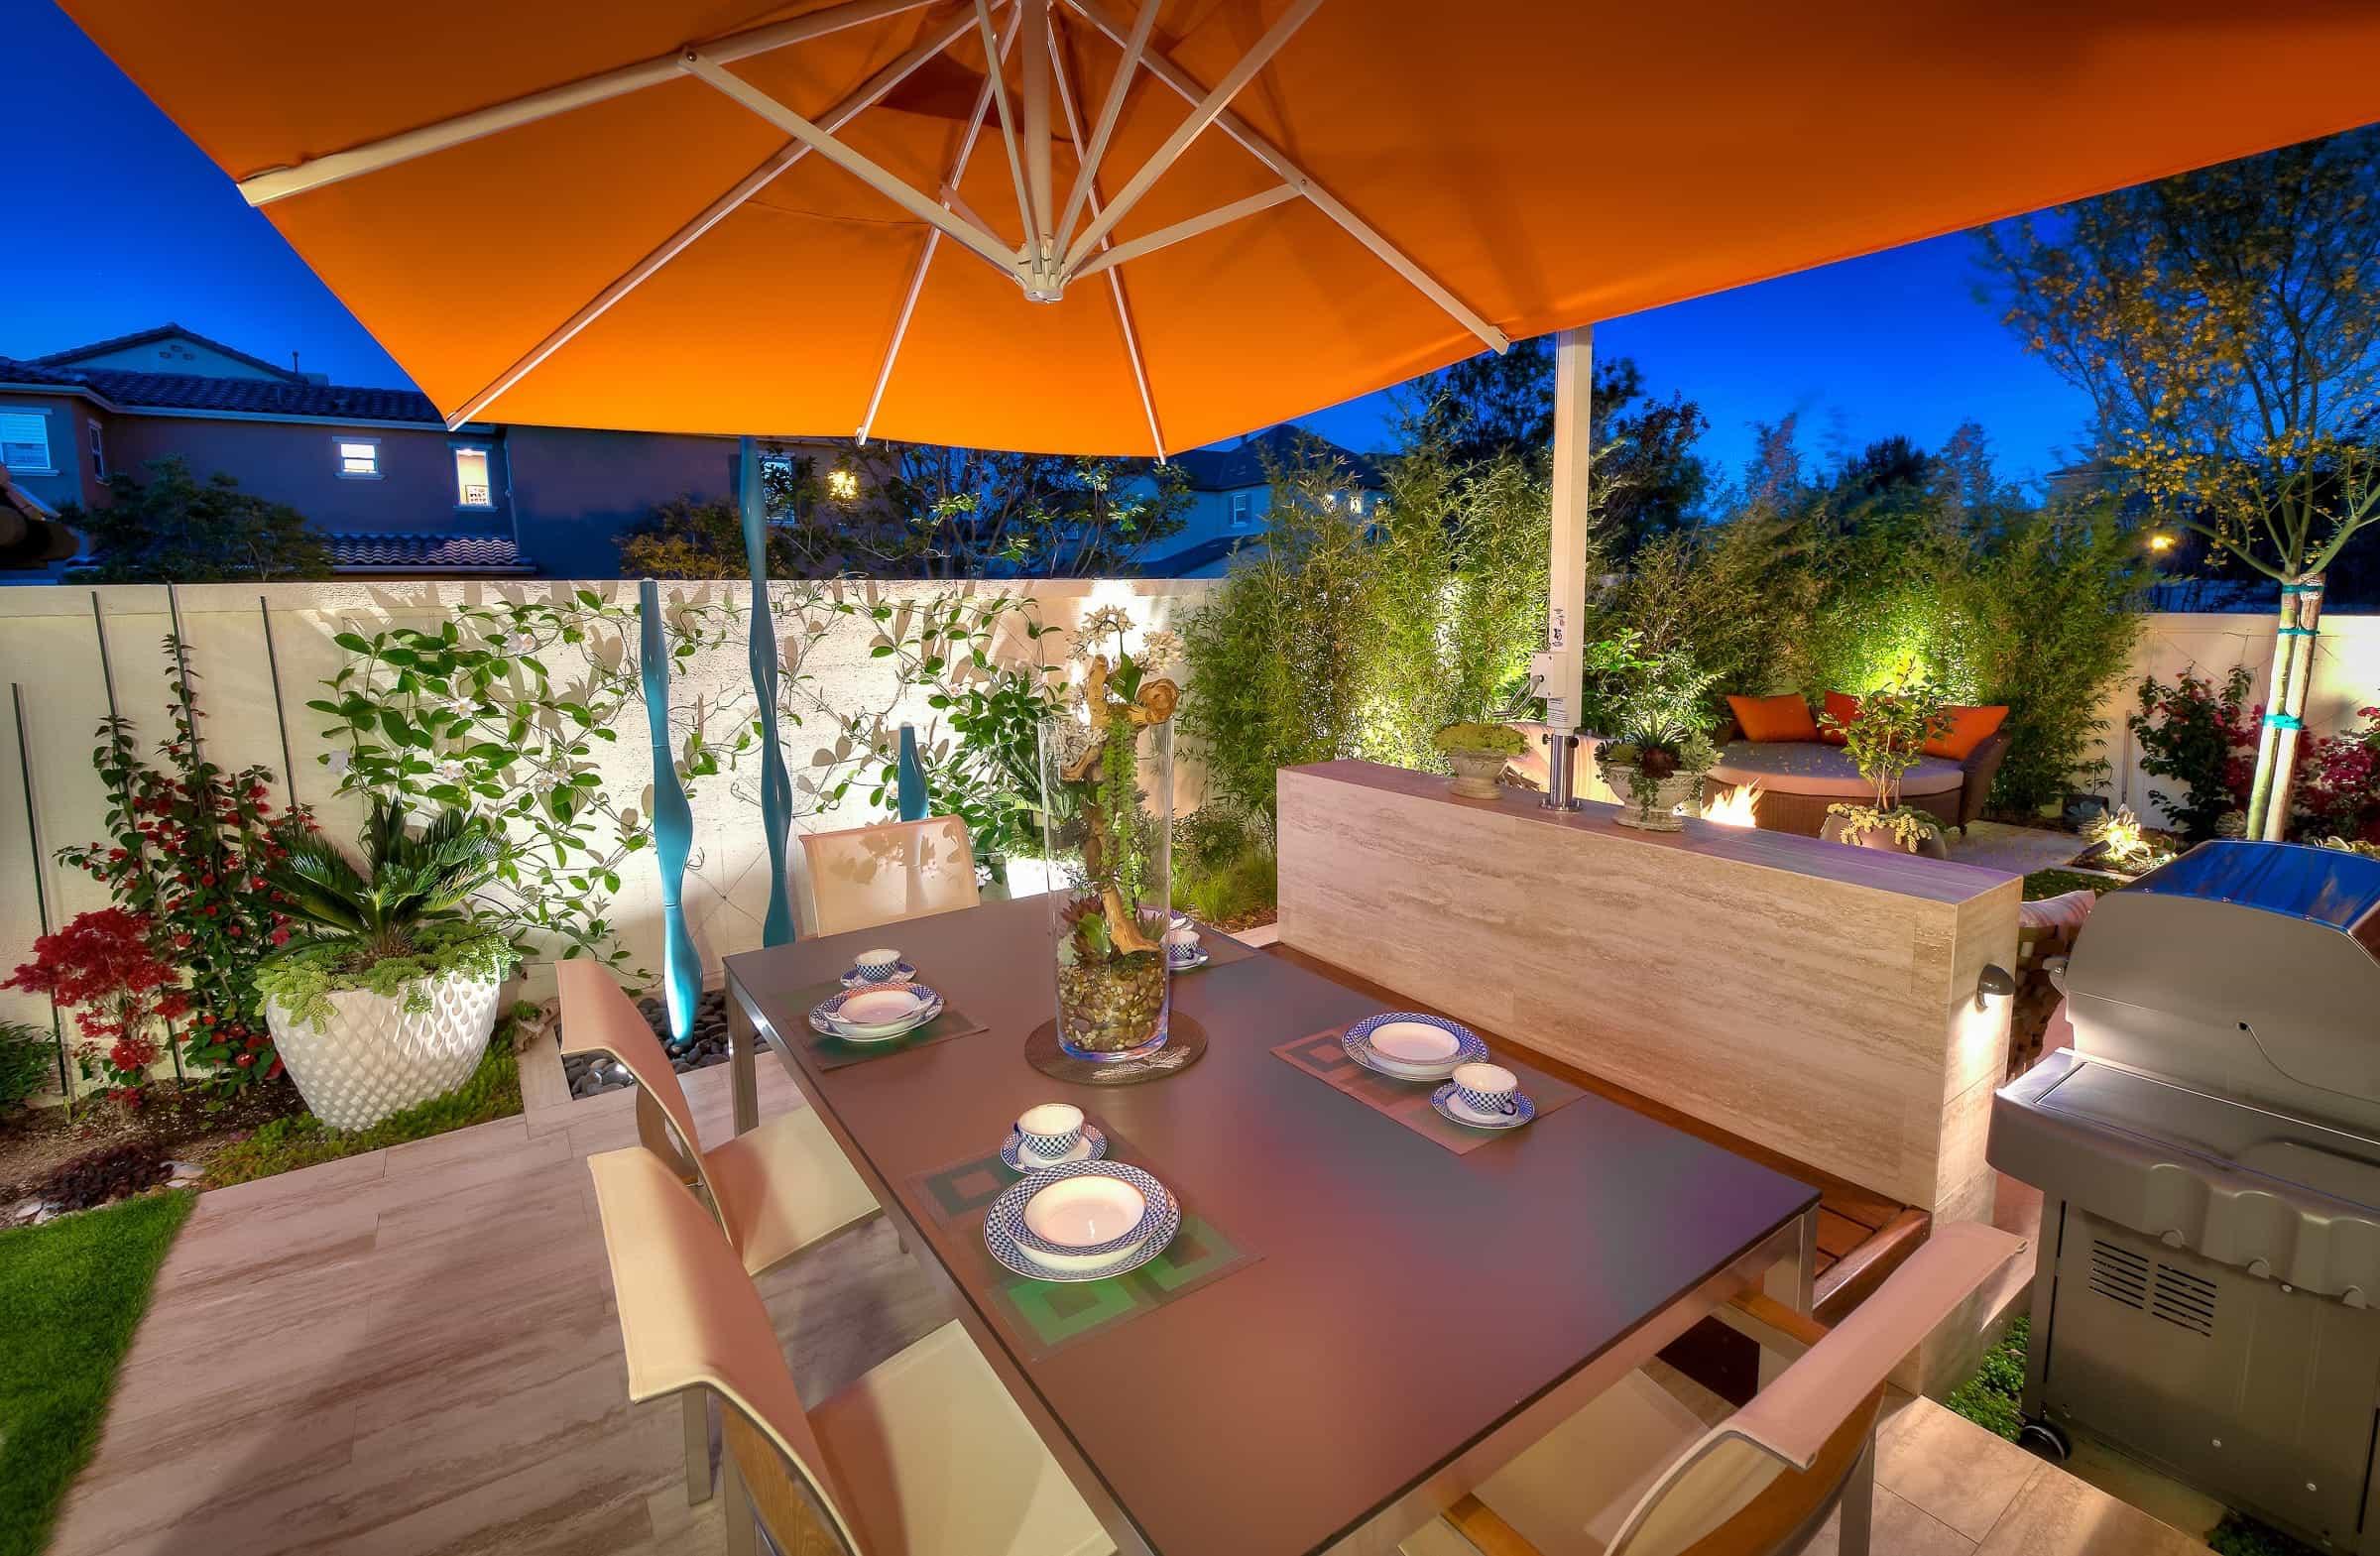 DIY Romantic Outdoor Dinner Ideas At Home #26158 | Garden ... on Romantic Backyard Ideas id=62129